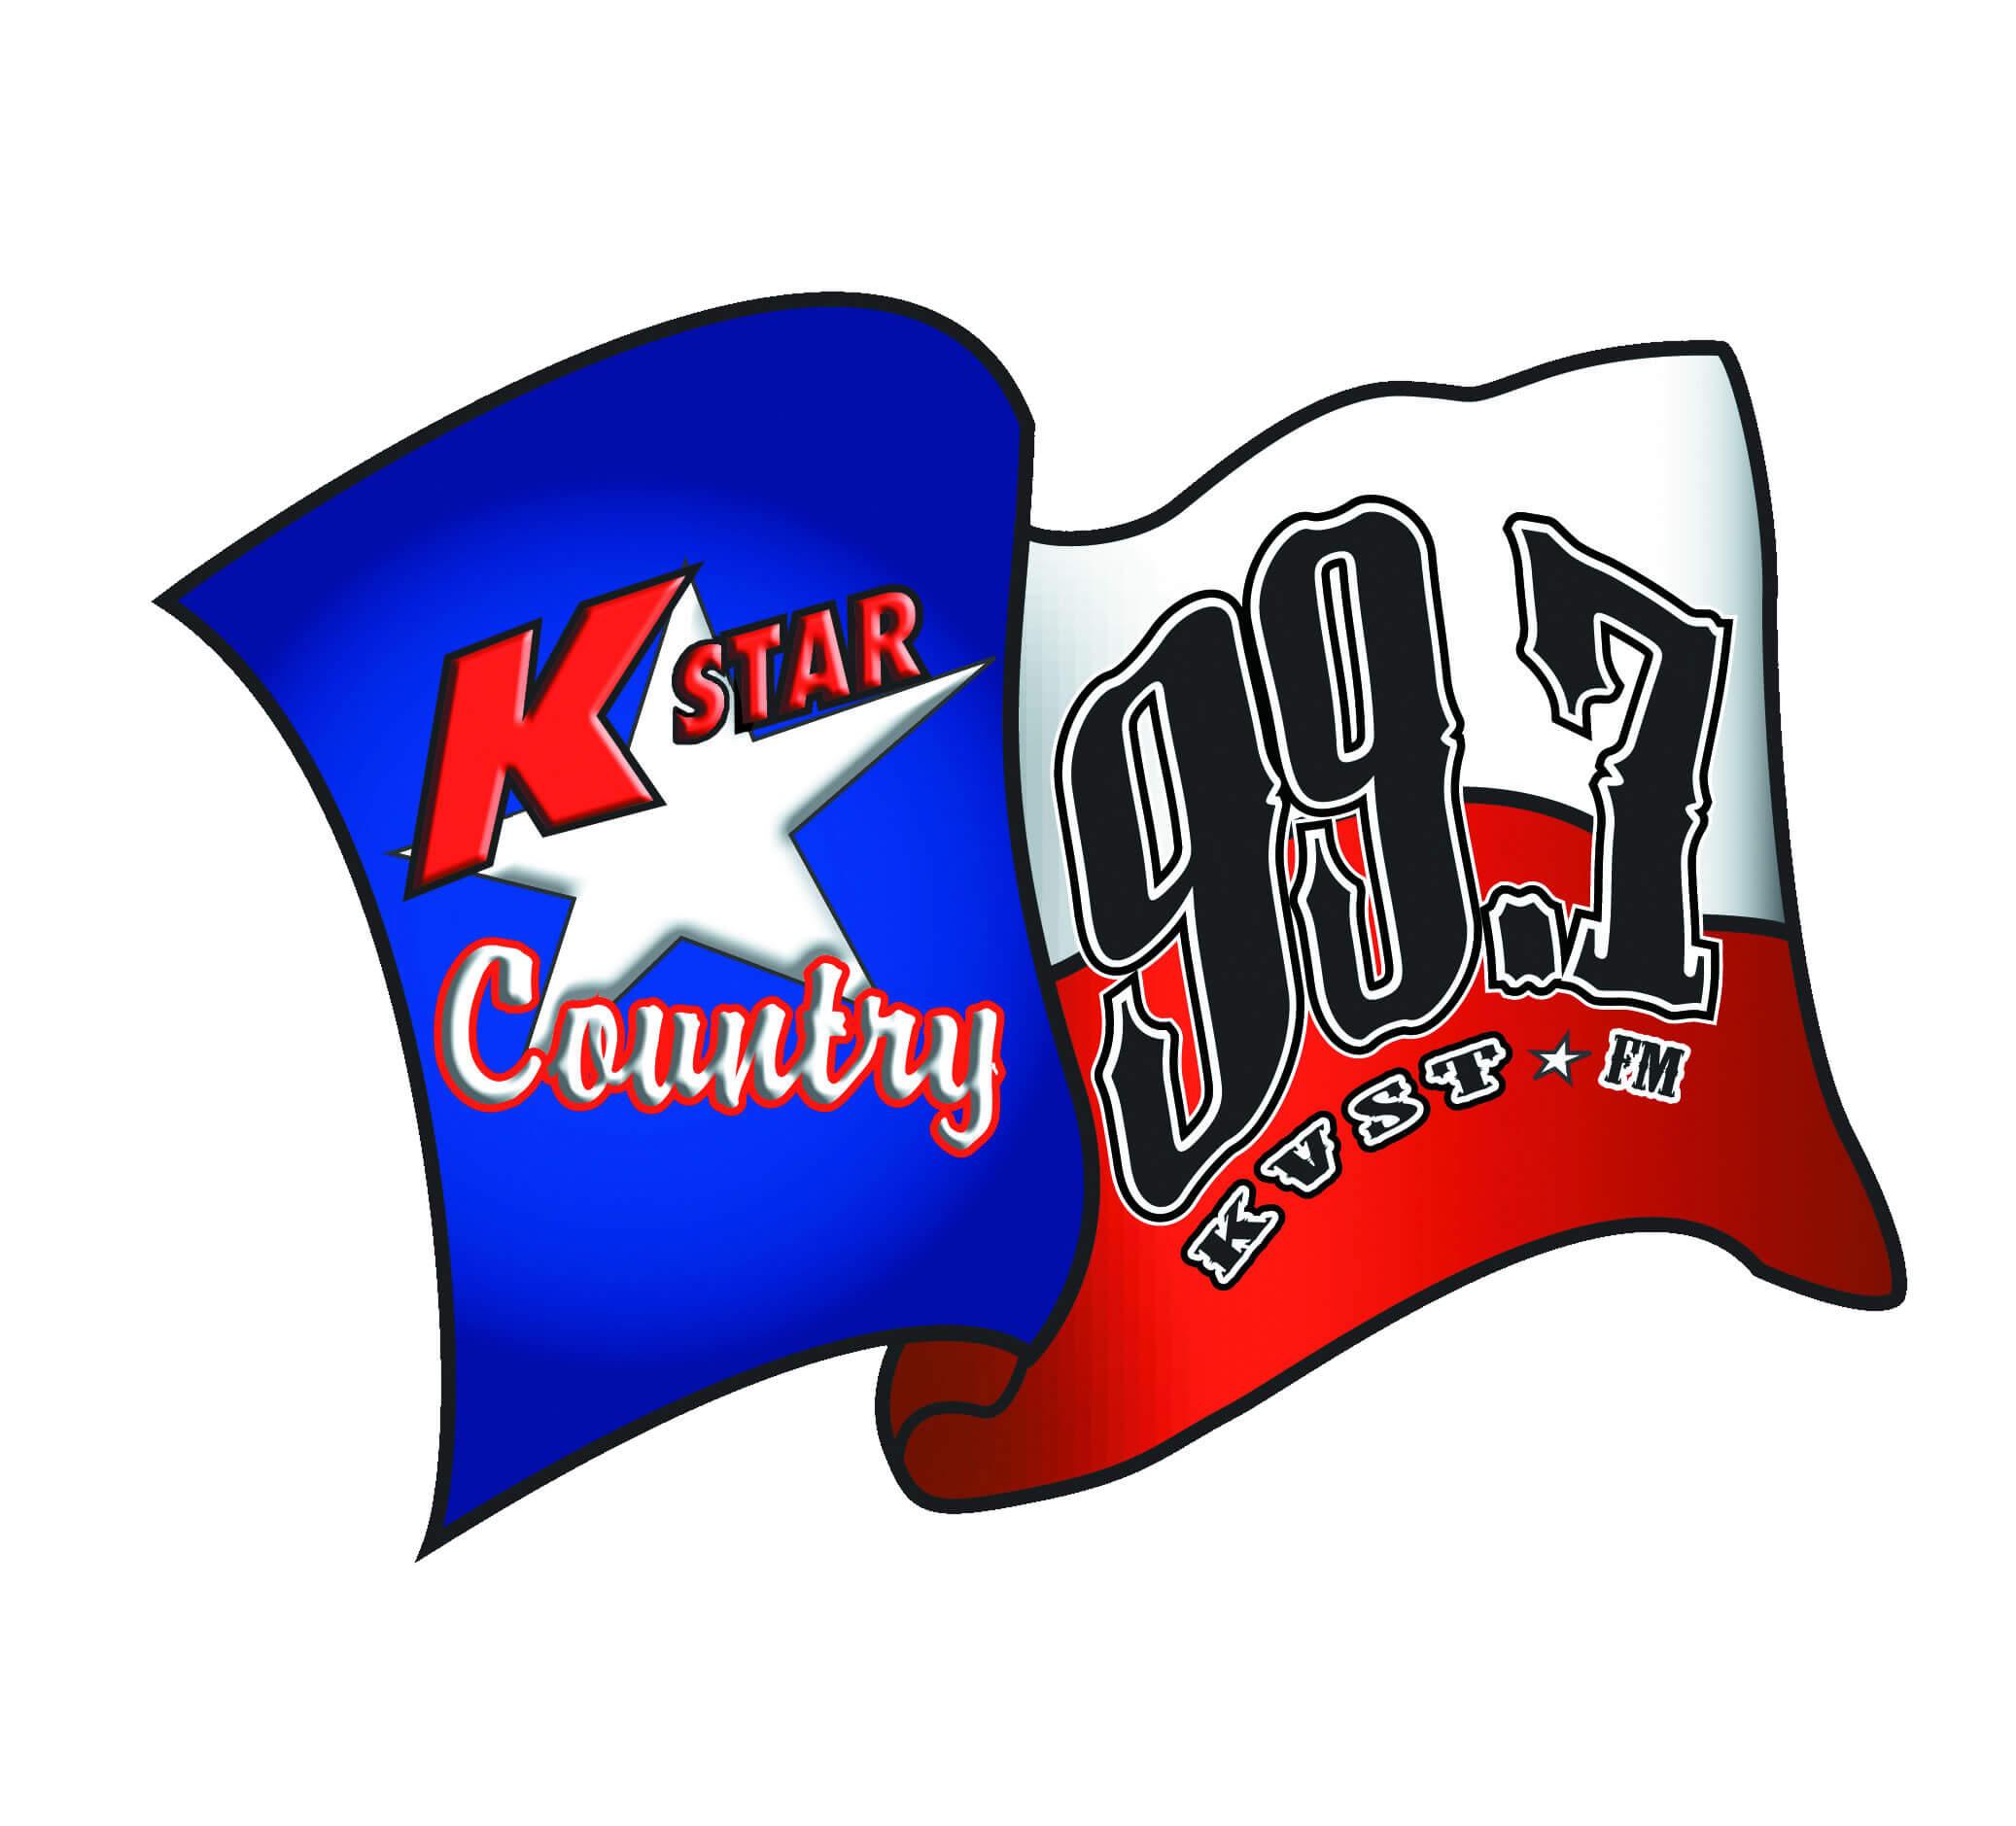 KSTAR Country